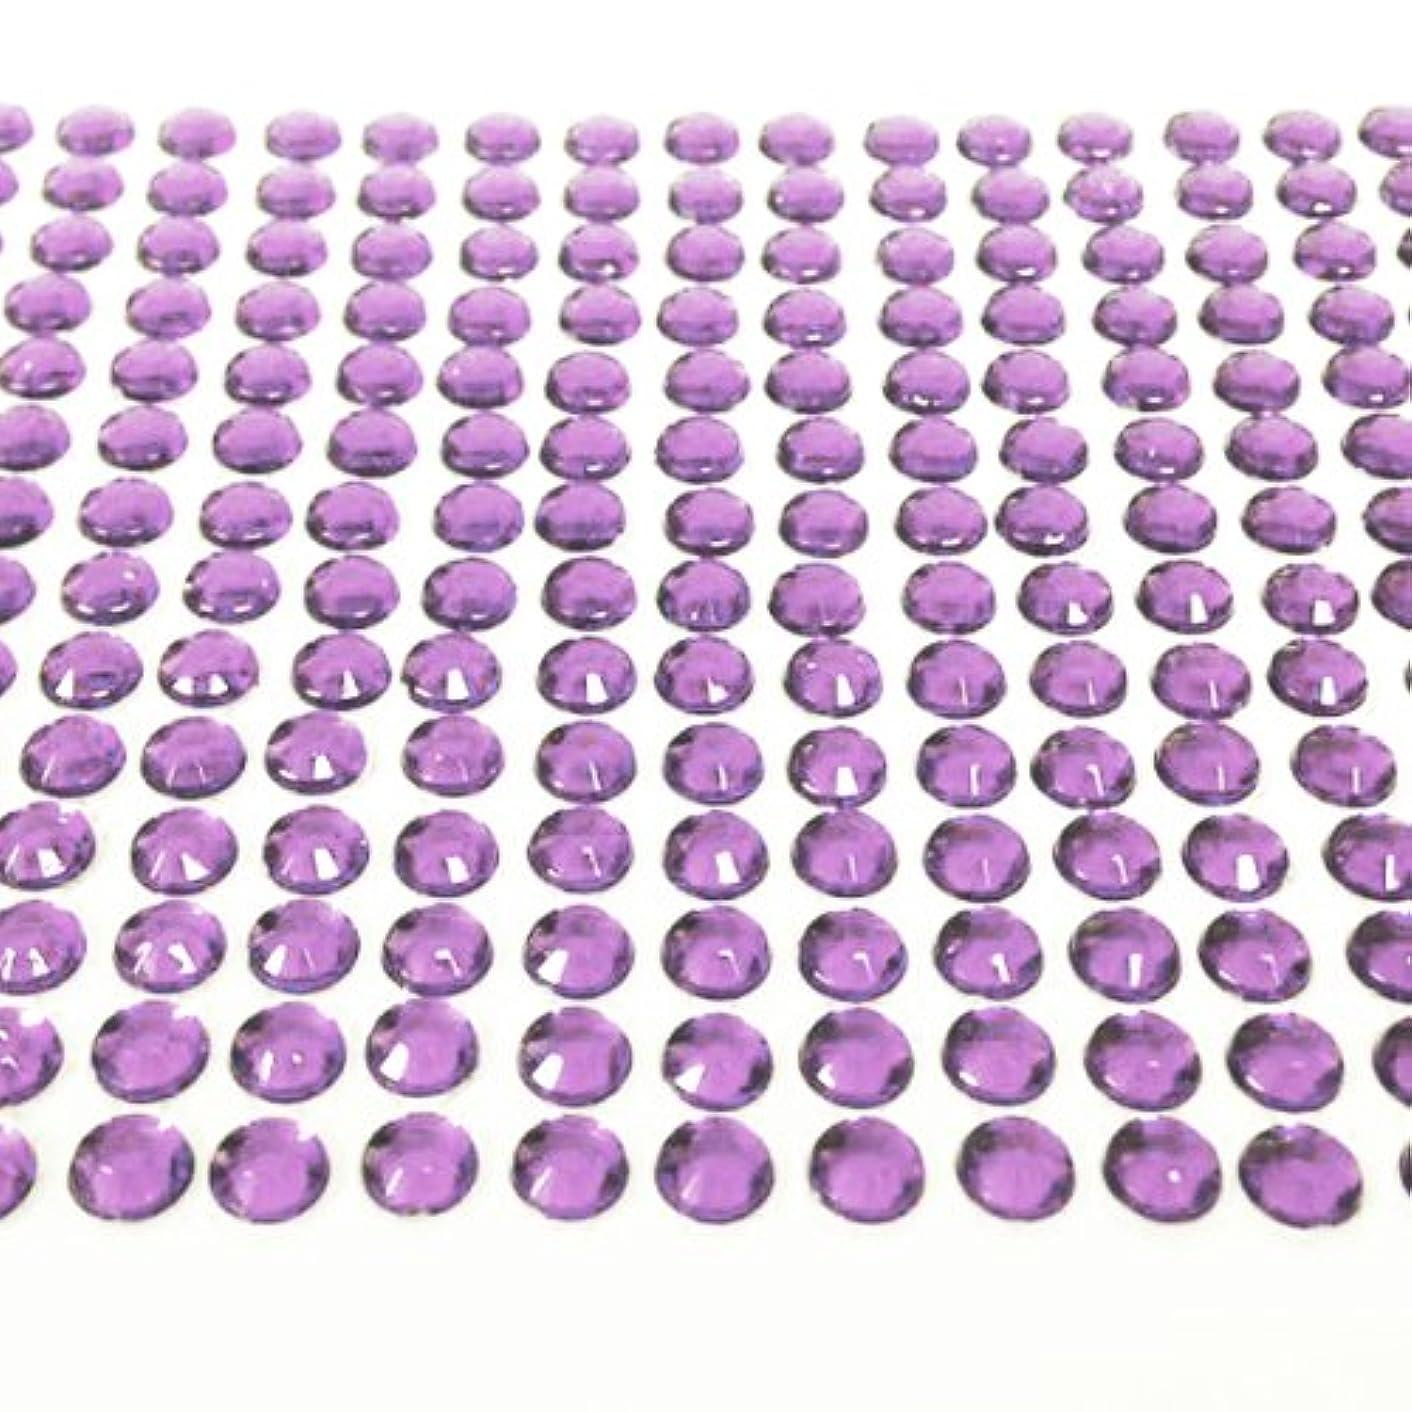 AllyDrew 6mm Crystal Diamond Adhesive Rhinestones, 500 pieces, Light Purple